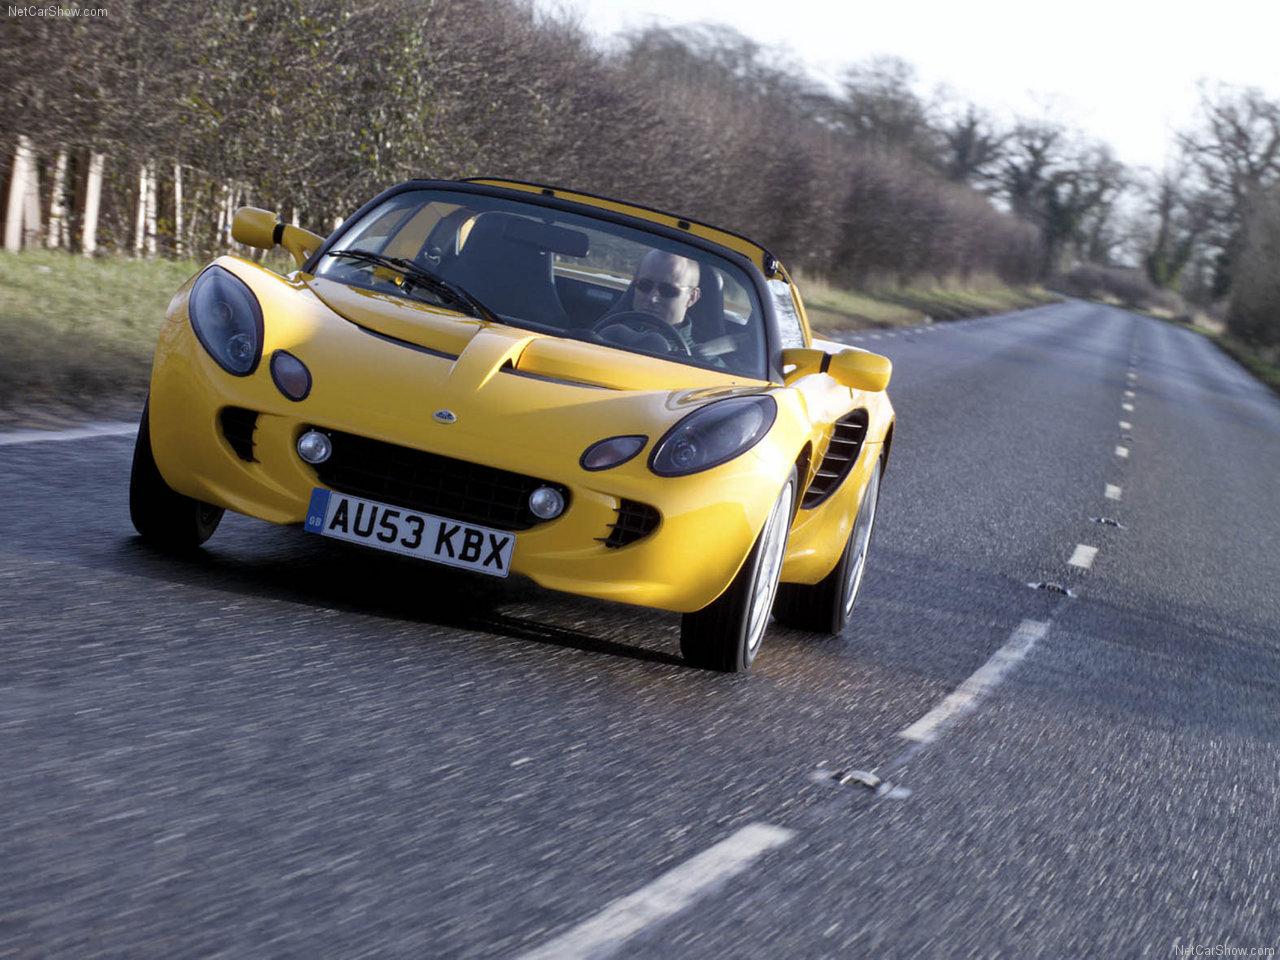 http://automobilecar.files.wordpress.com/2009/07/lotus-elise_2005_1280x960_wallpaper_08.jpg